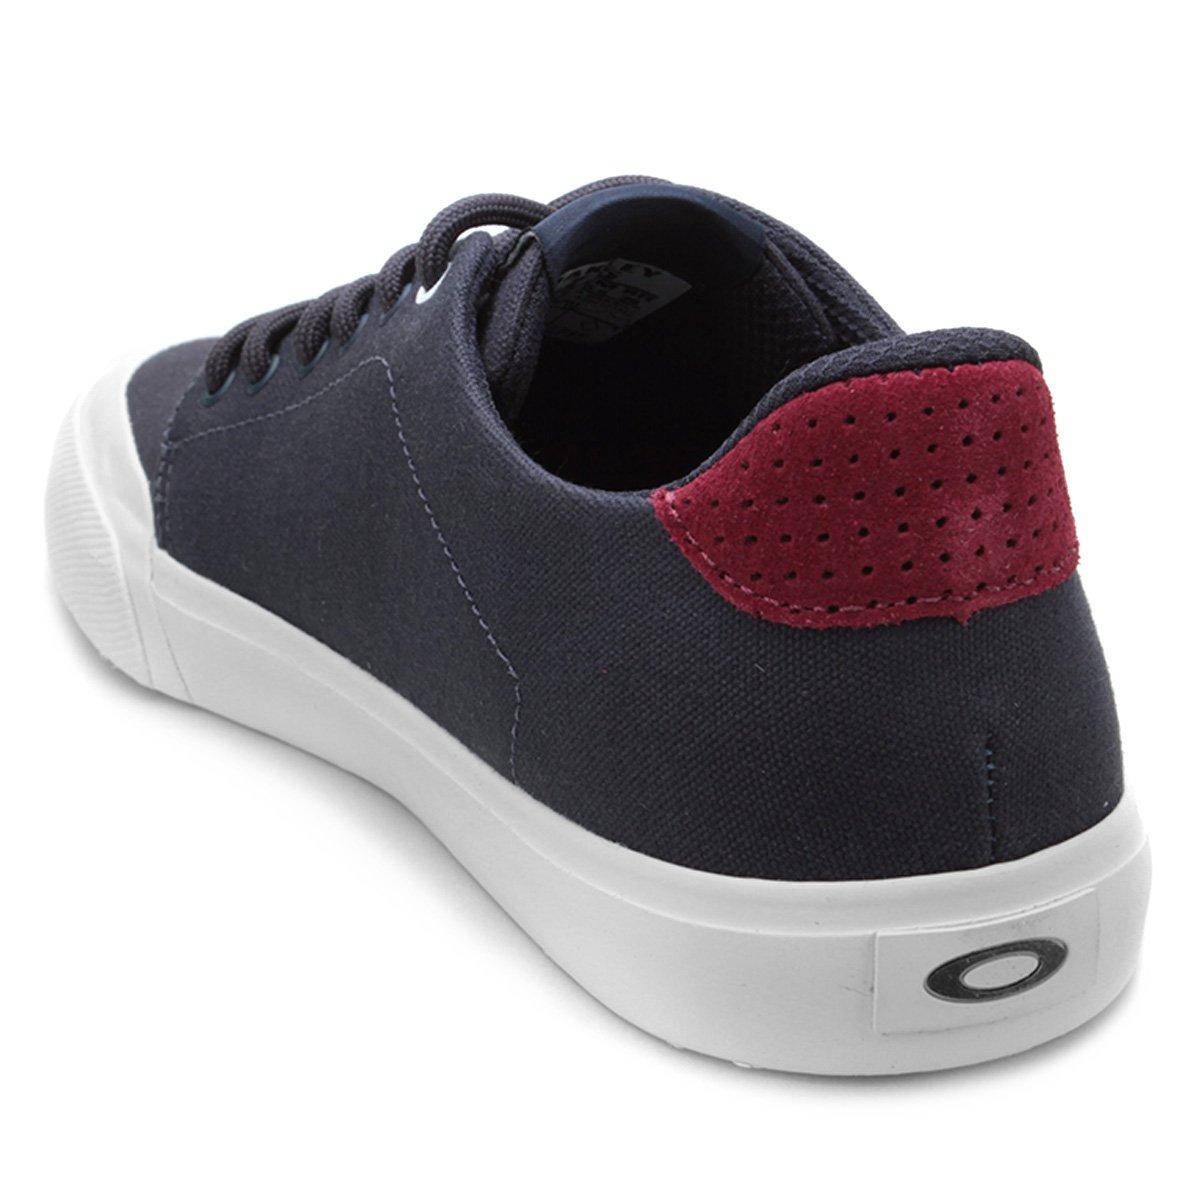 70bb64dca17ea Tênis Oakley Liv Masculino - Marinho - Compre Agora   Netshoes